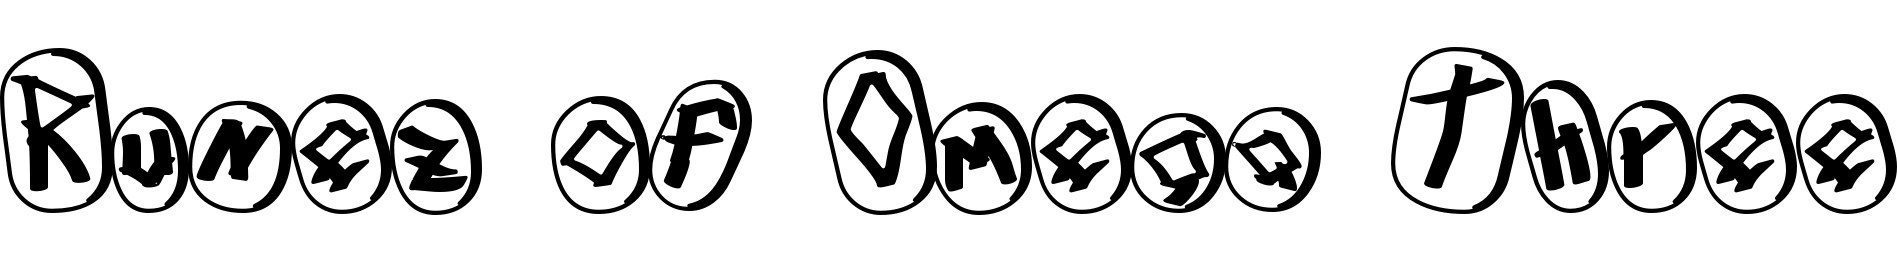 Runez of Omega Three